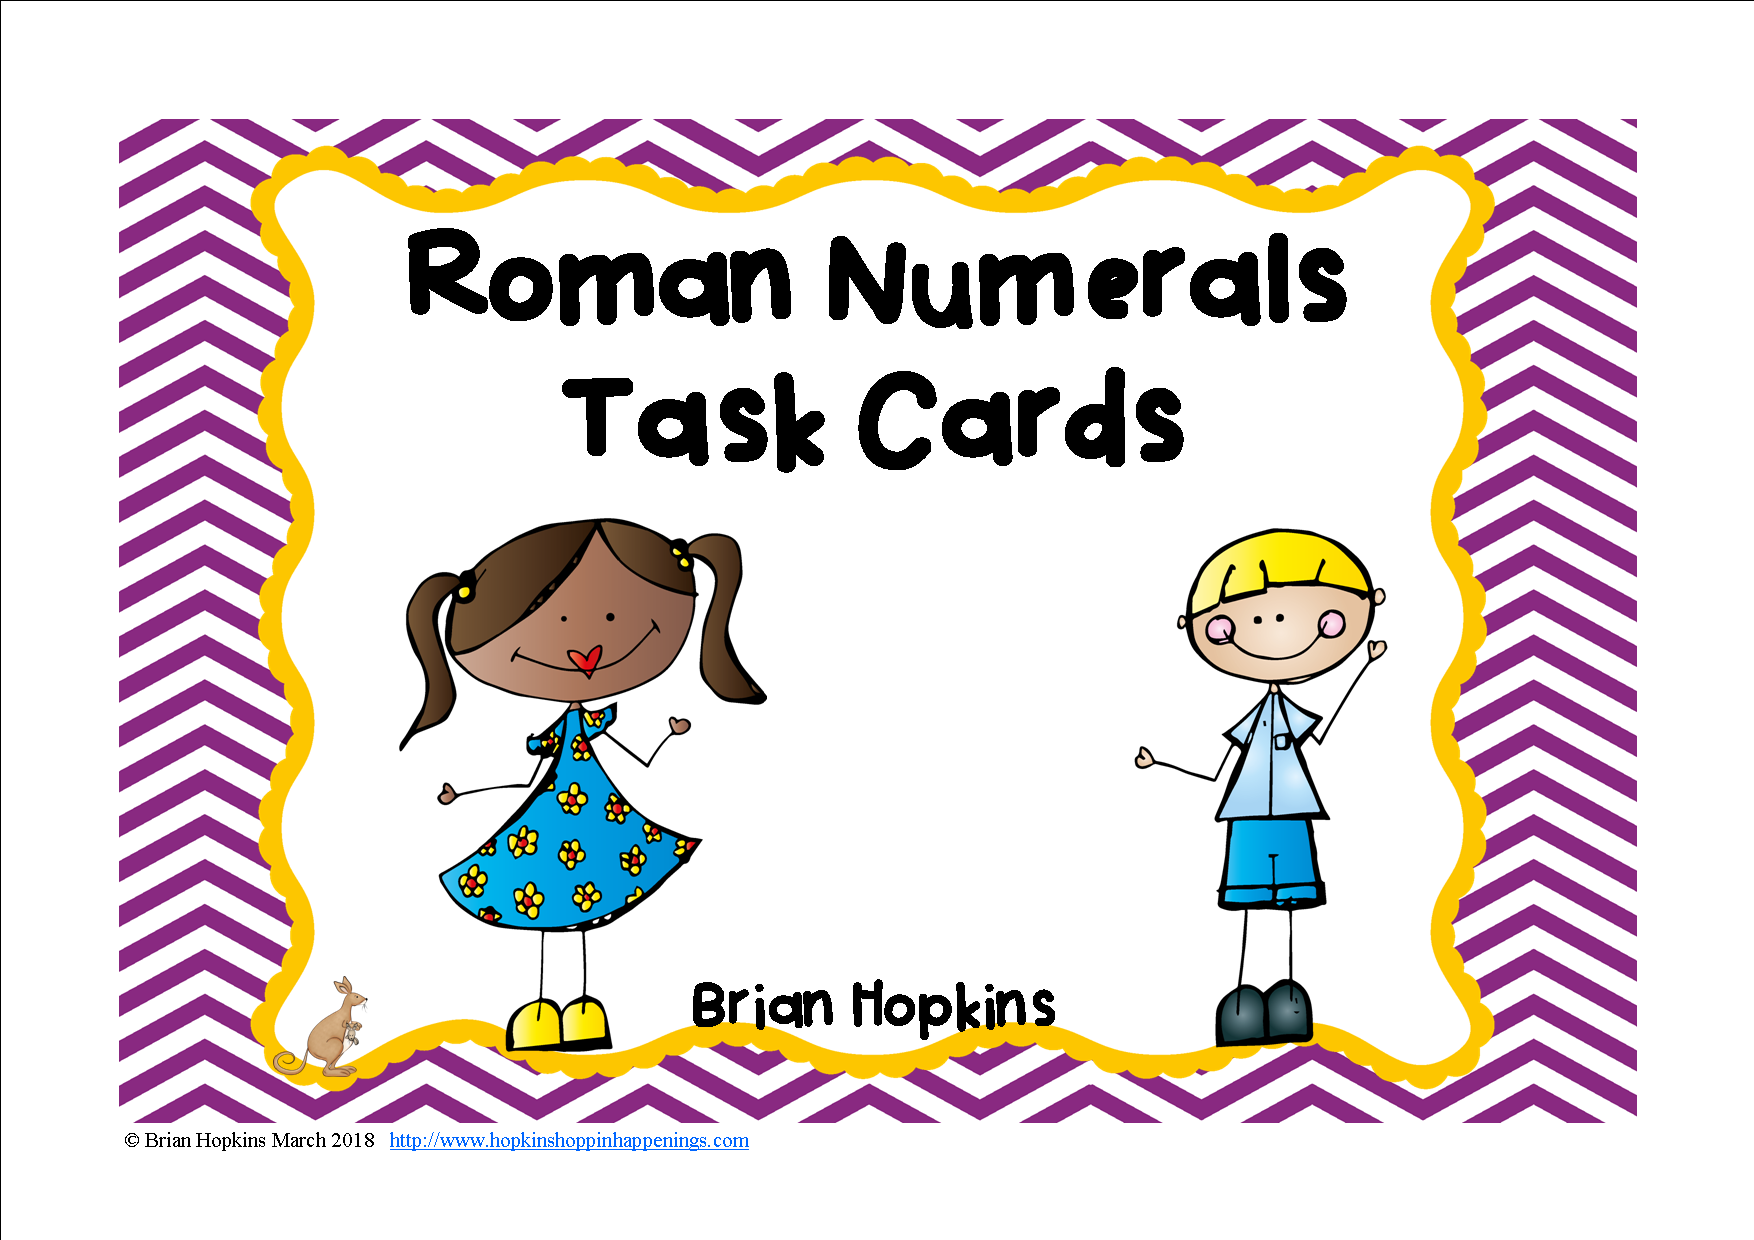 Roman Numerals Task Cards